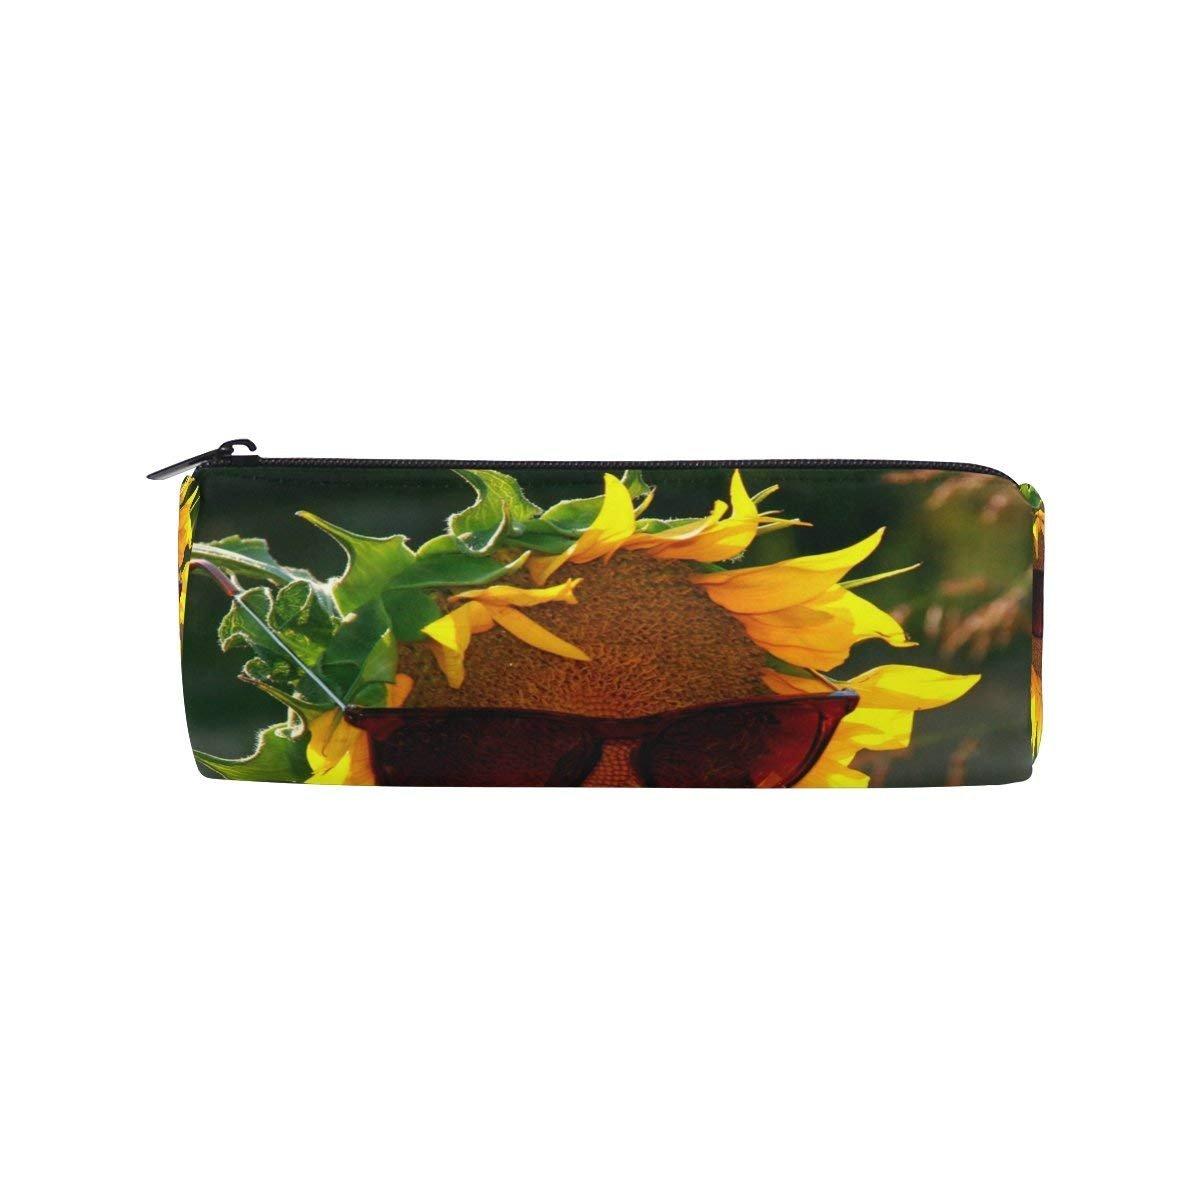 Sunflower Sunglasses Round Pencil Case Stationery Bag Zipper Pouch Pencil Holder